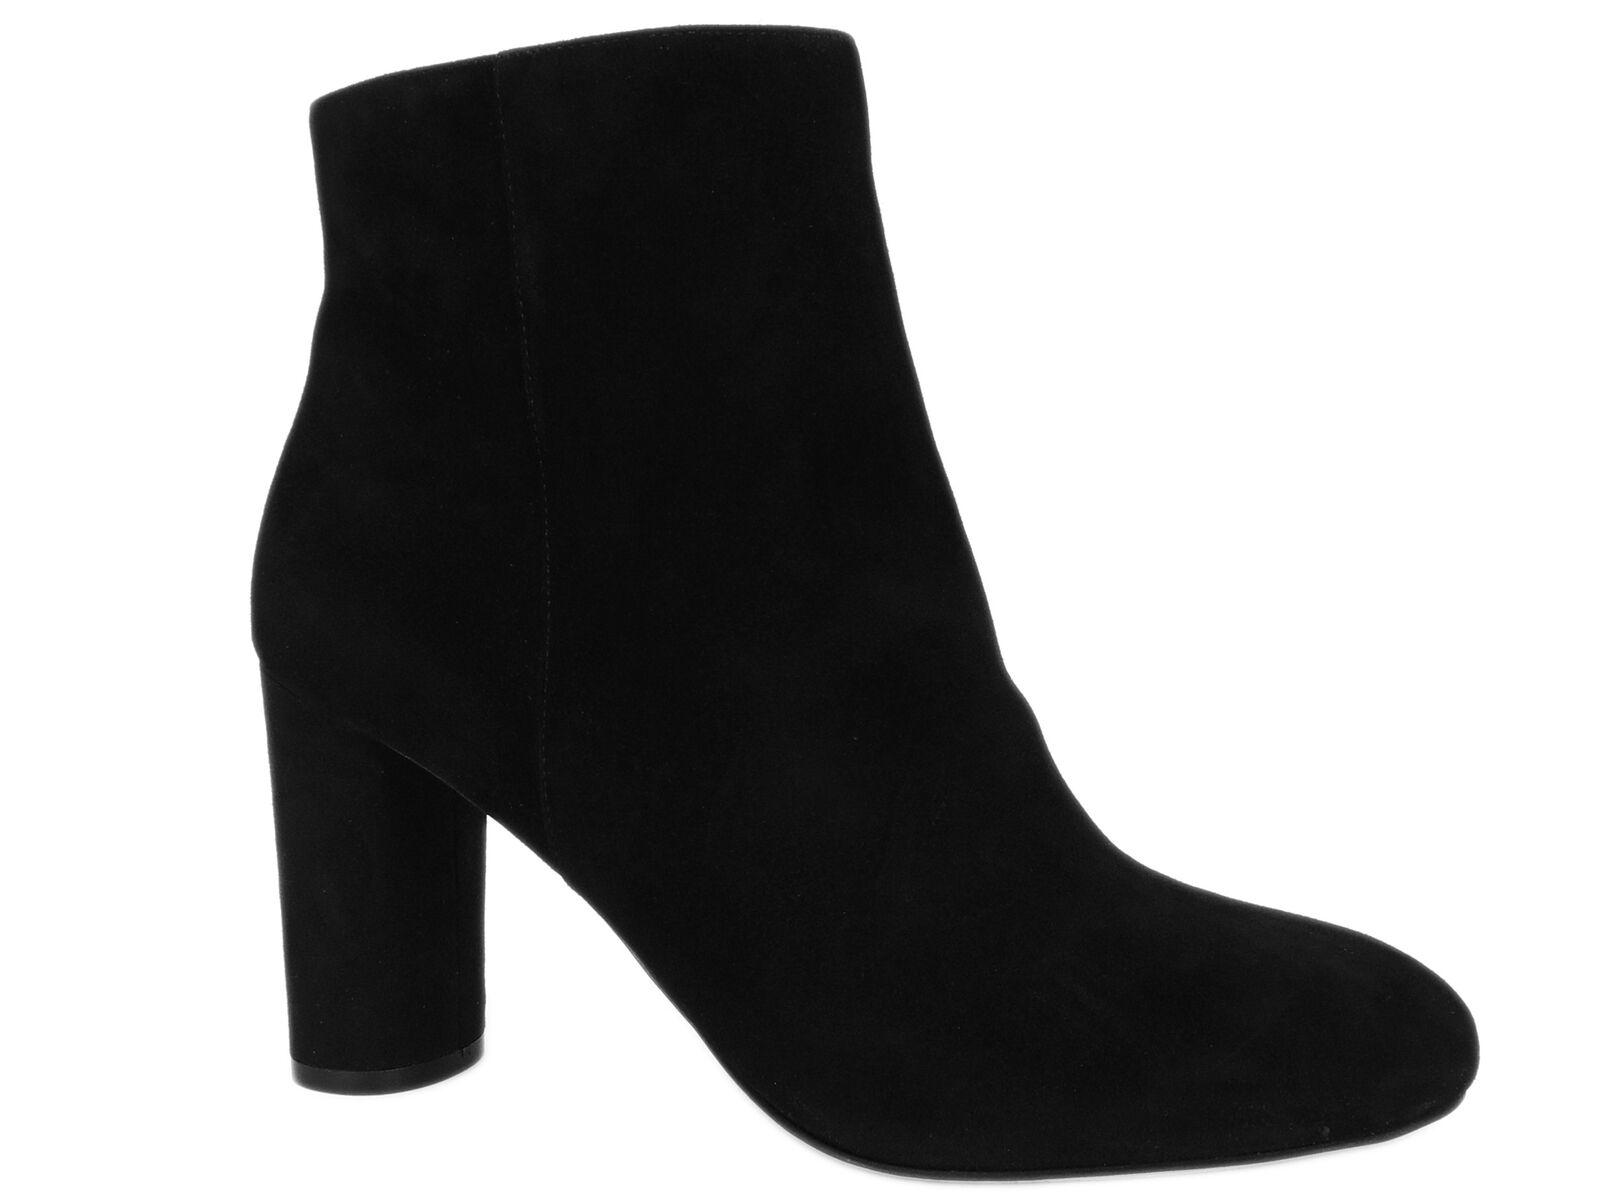 INC International Concepts Taytee Block-Heel Boots Black Suede Size 10 M